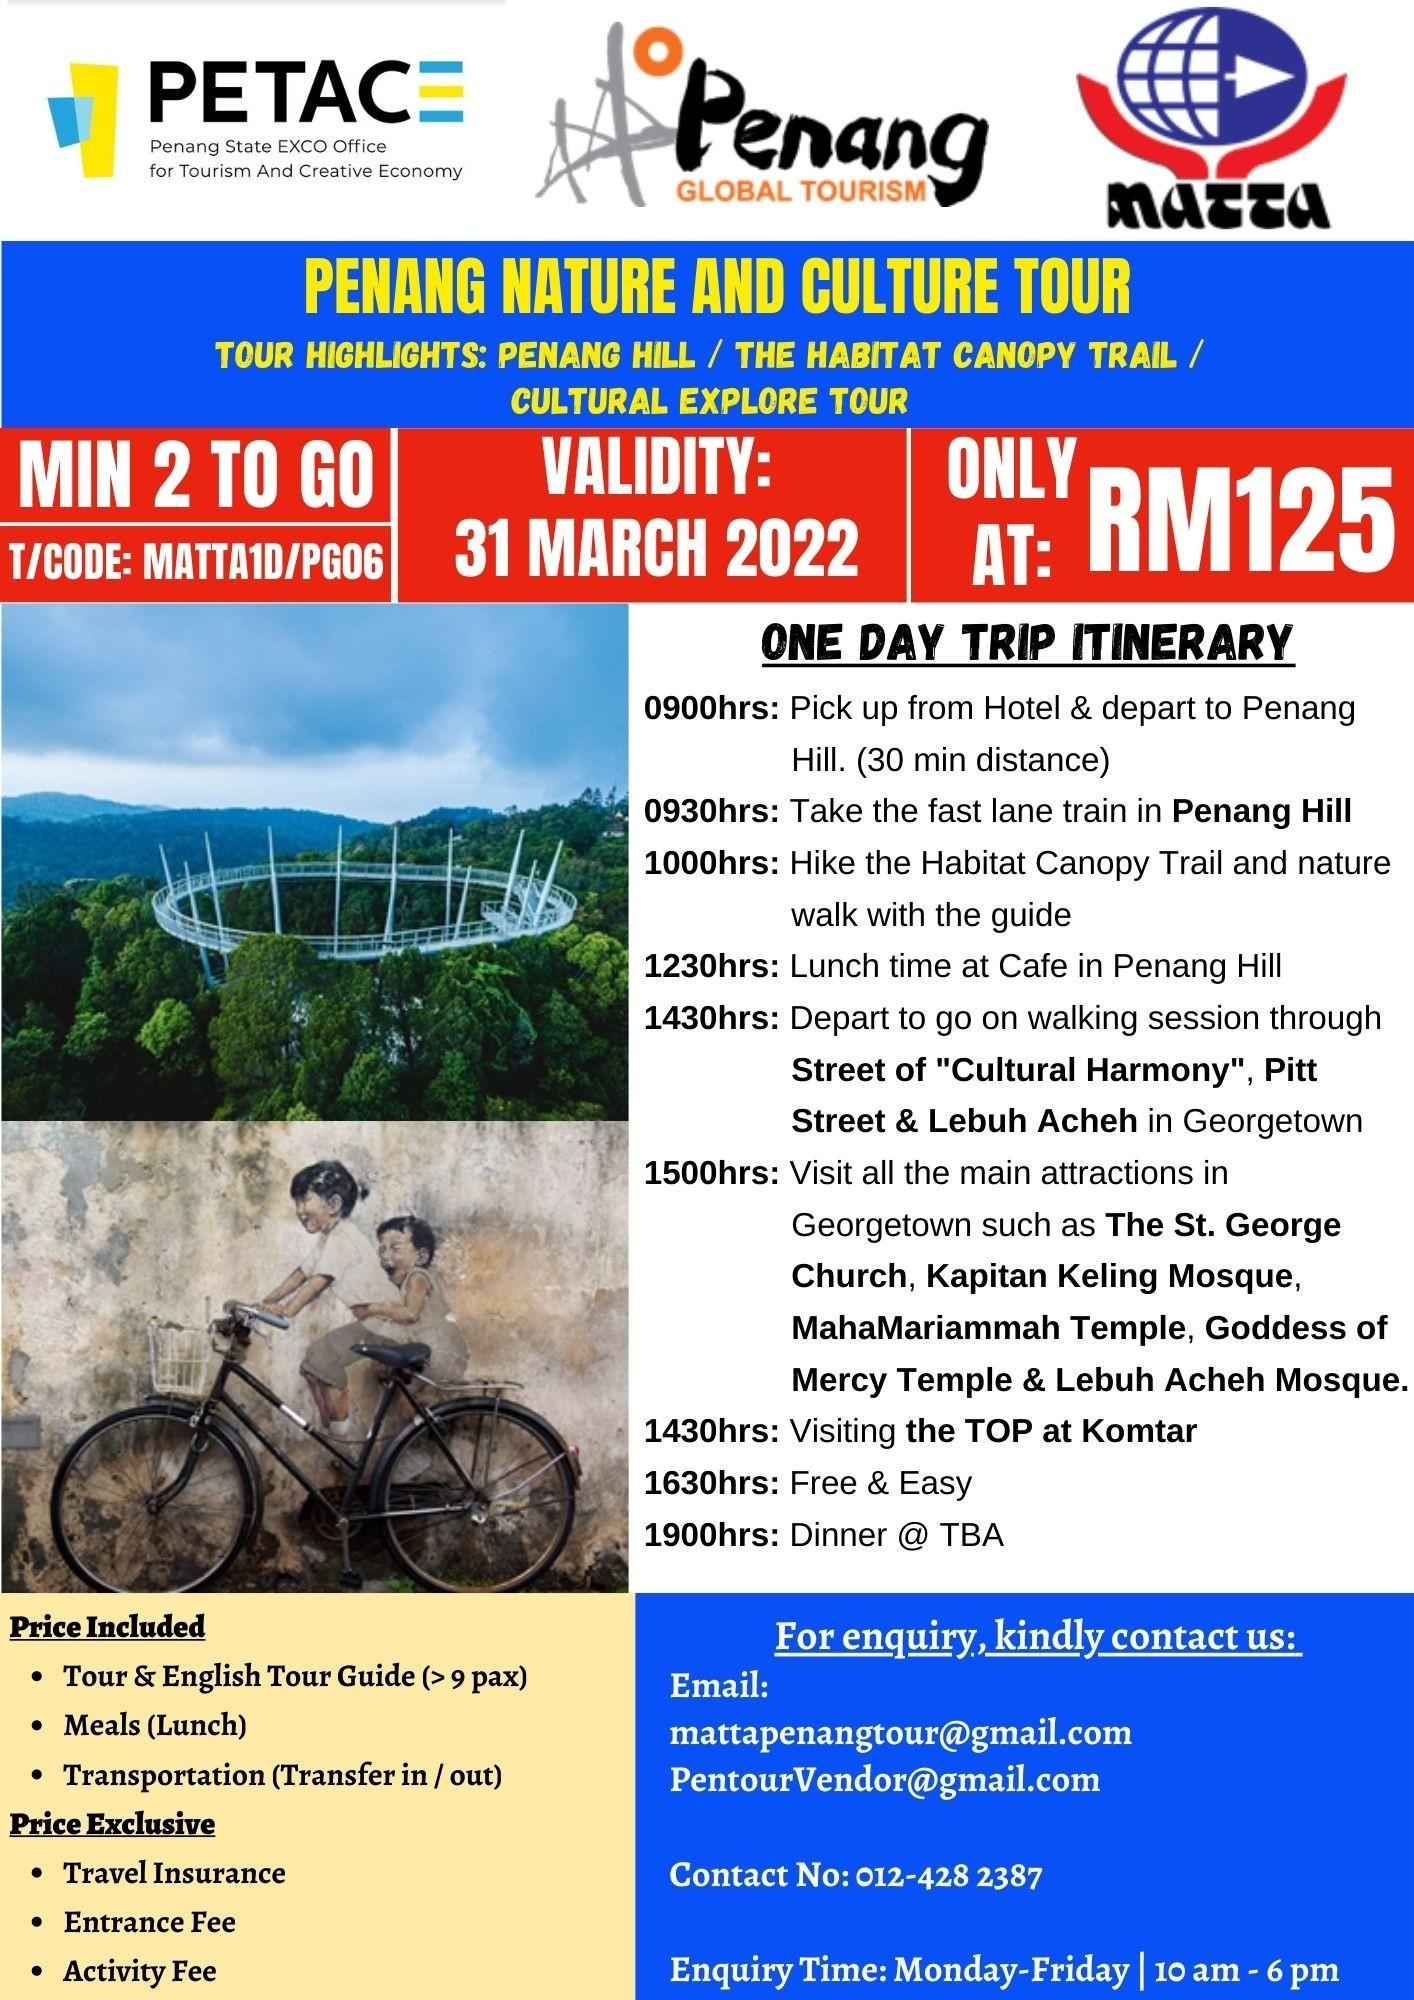 Penang Nature and Culture Tour